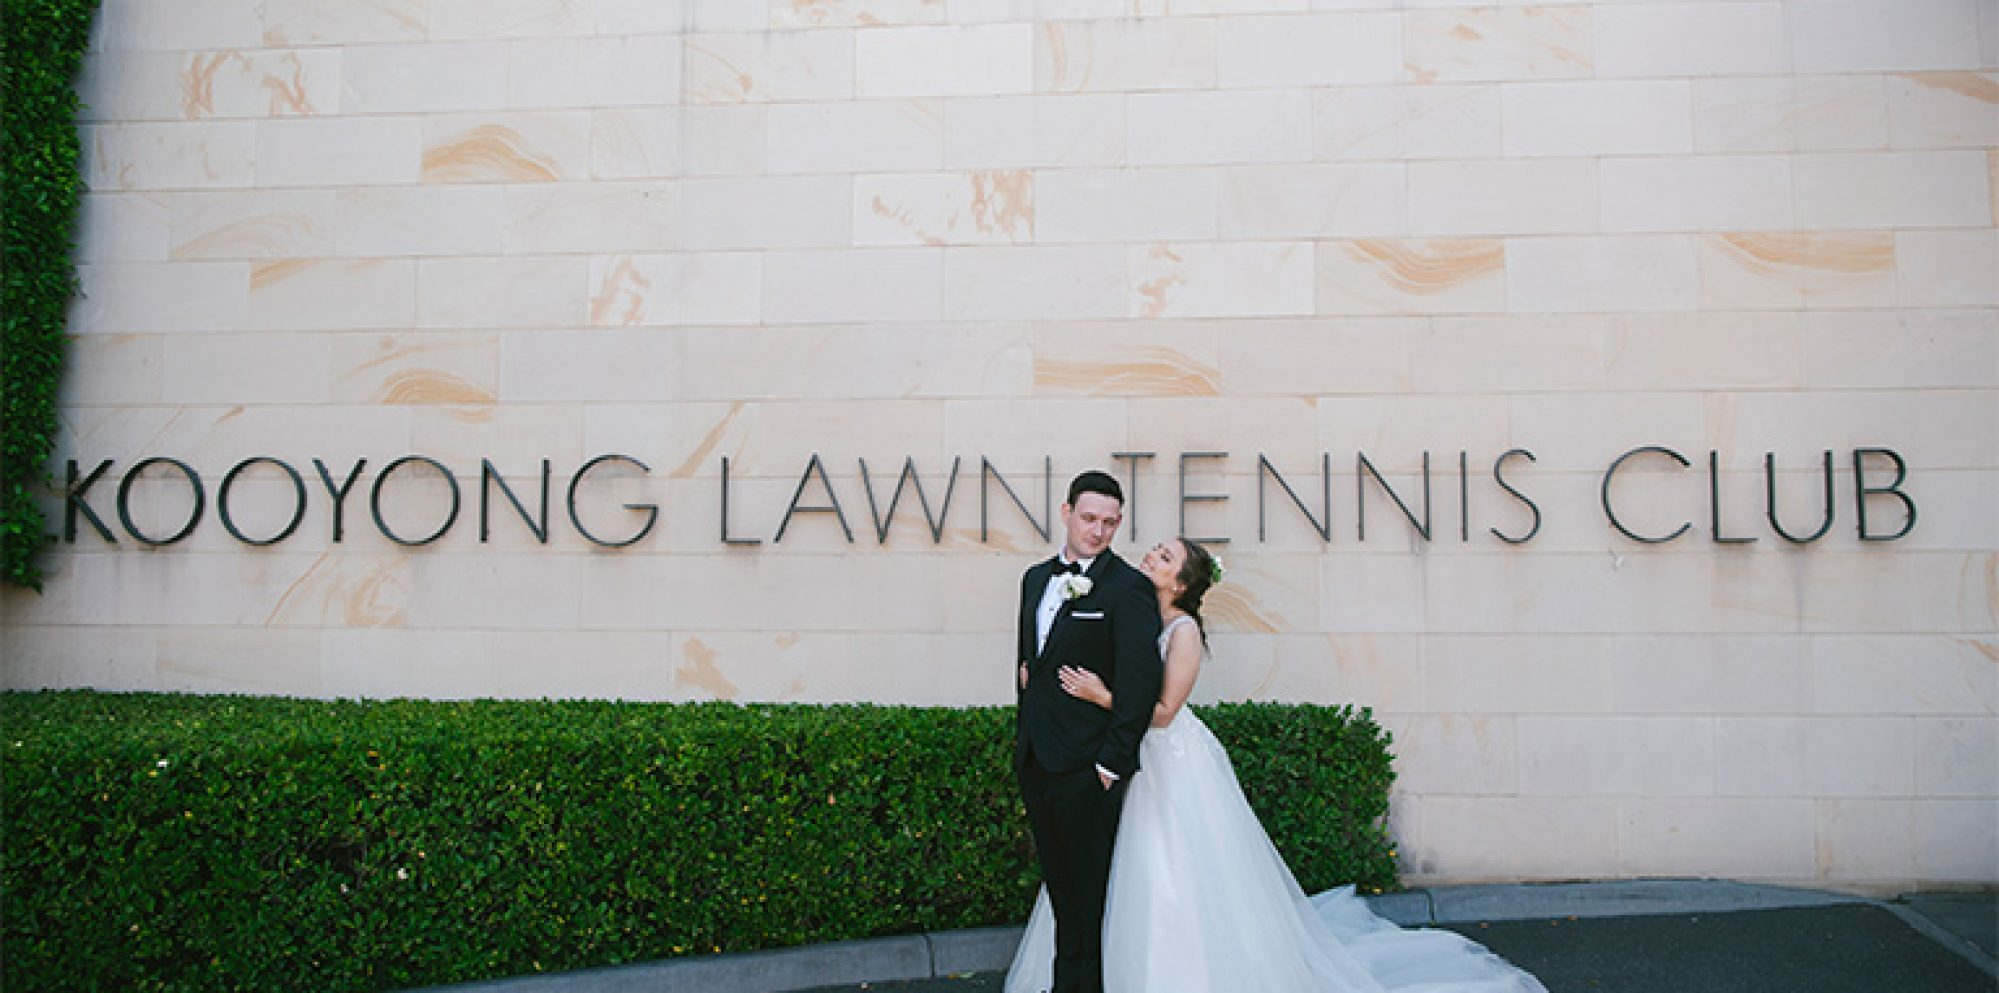 Laura & nichola wedding photography @ kooyong lawn tennis club